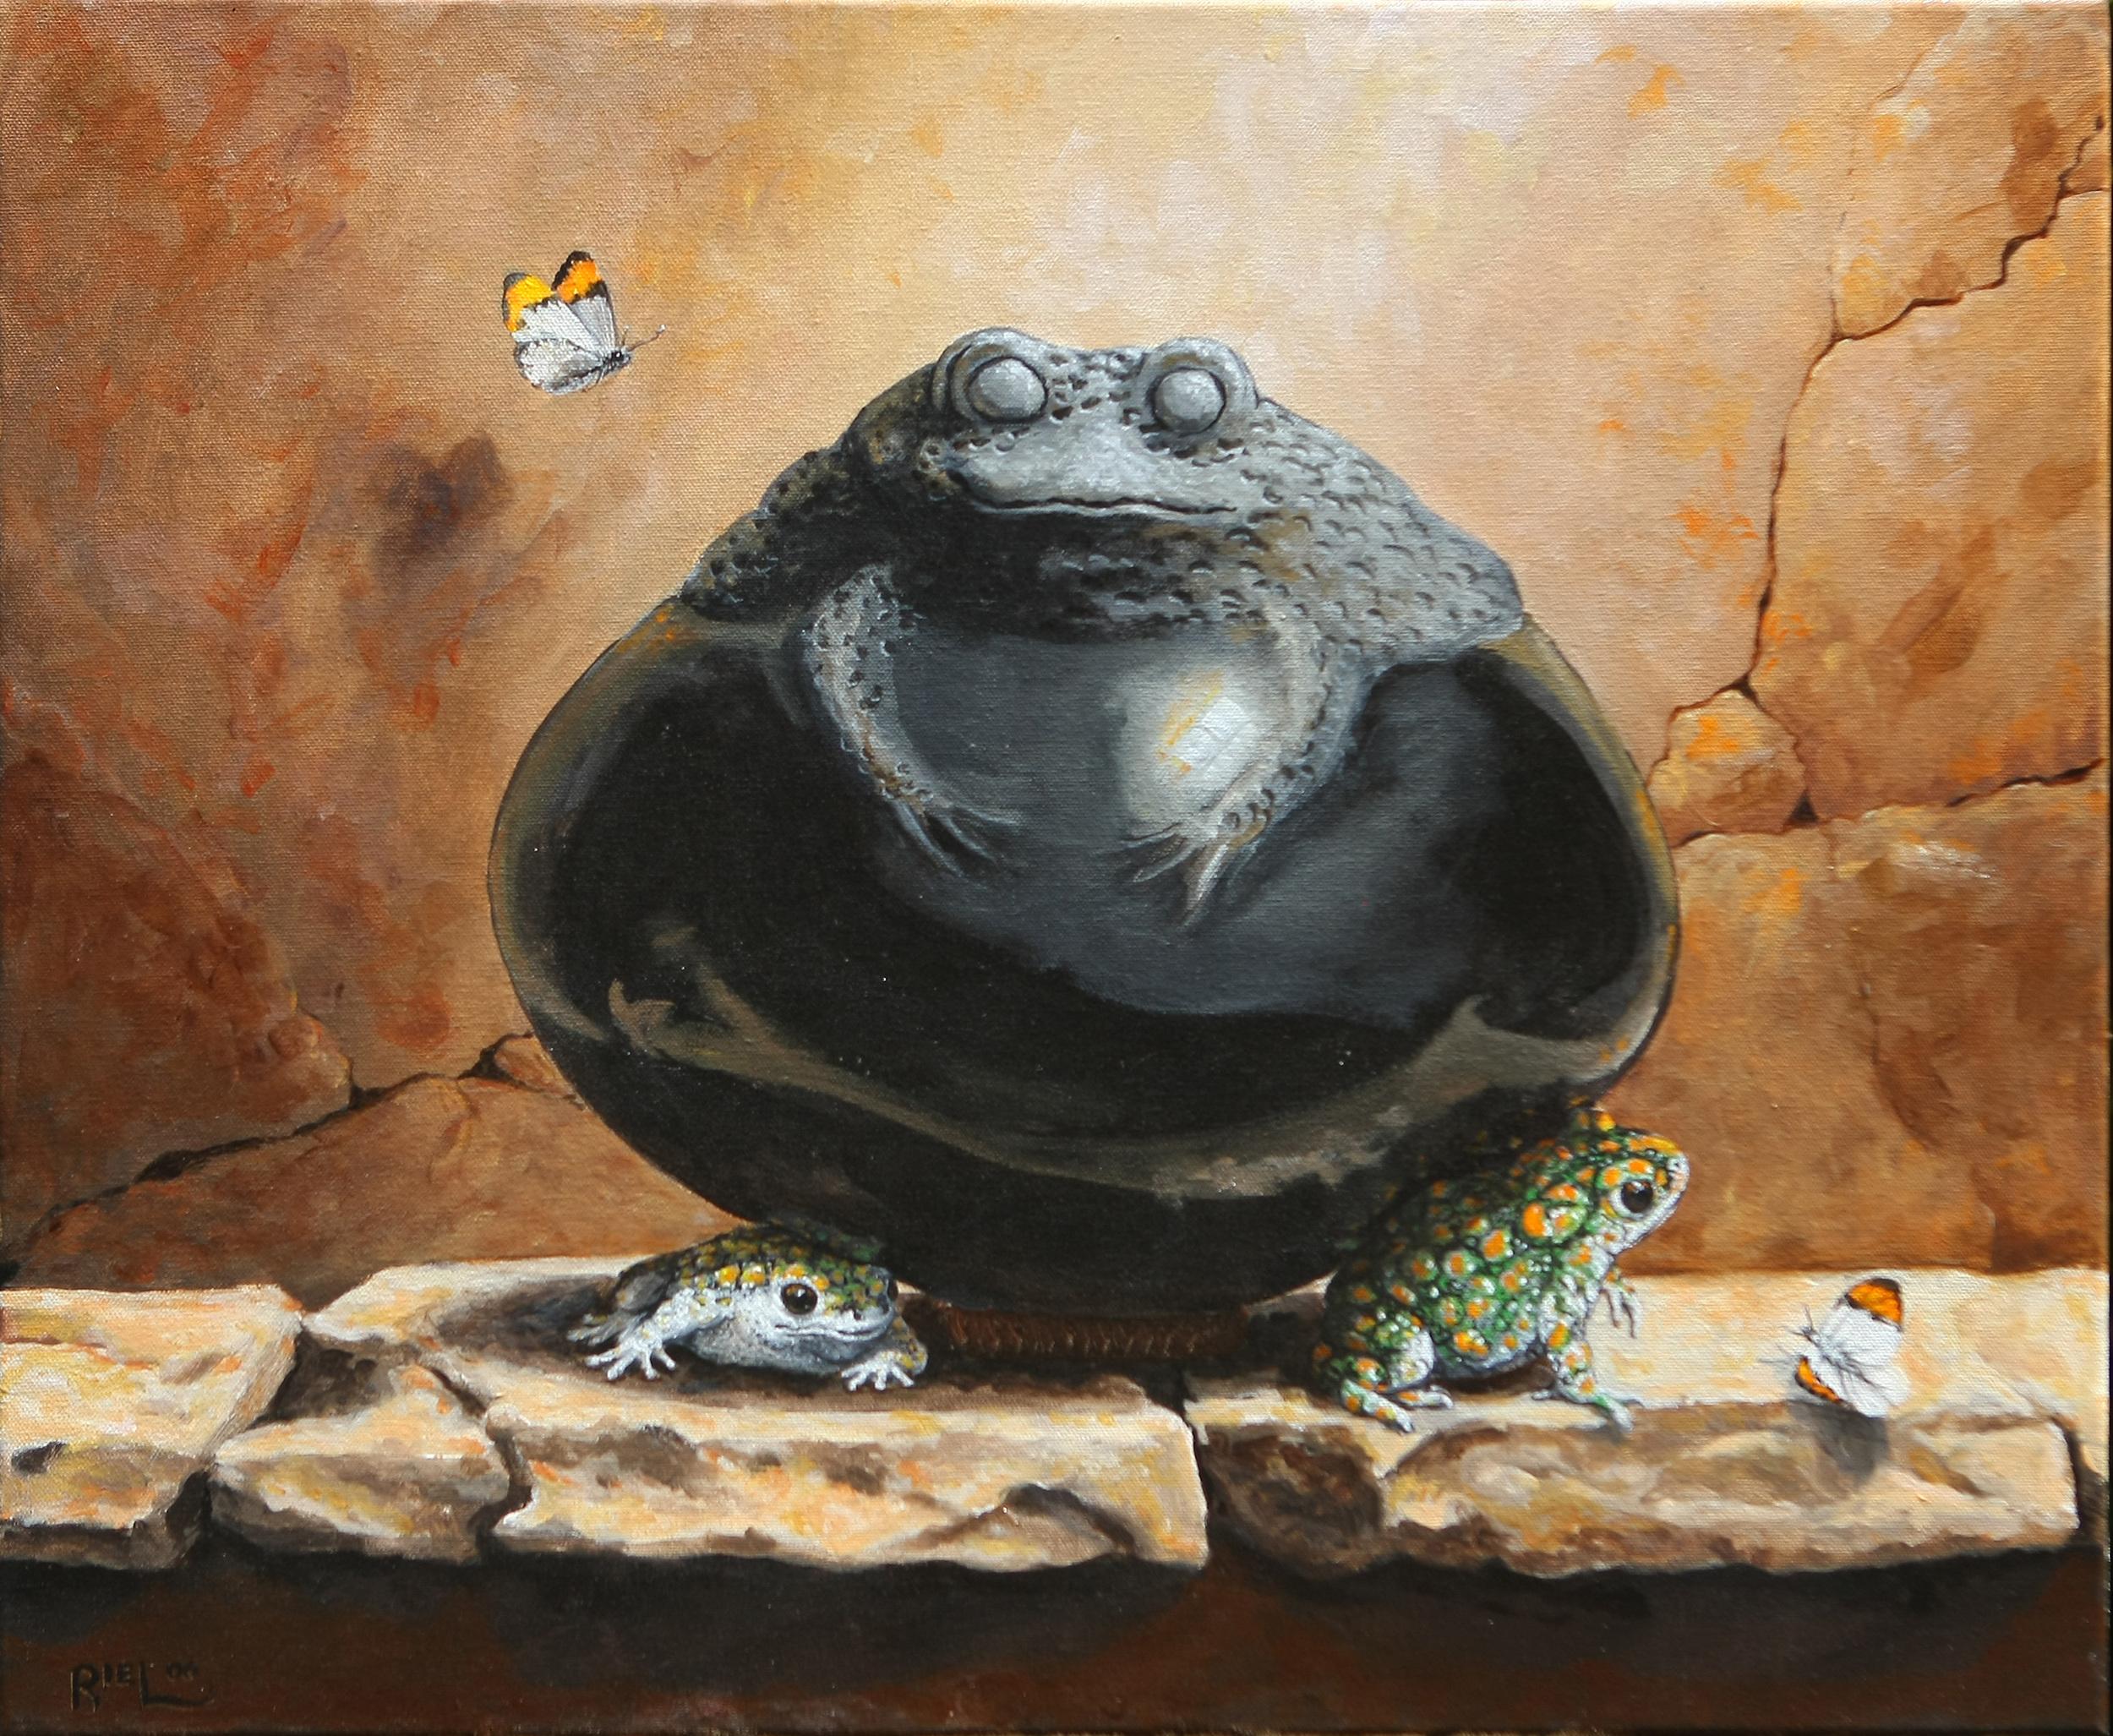 The Rain Bringers - Sonoran Toad Pot